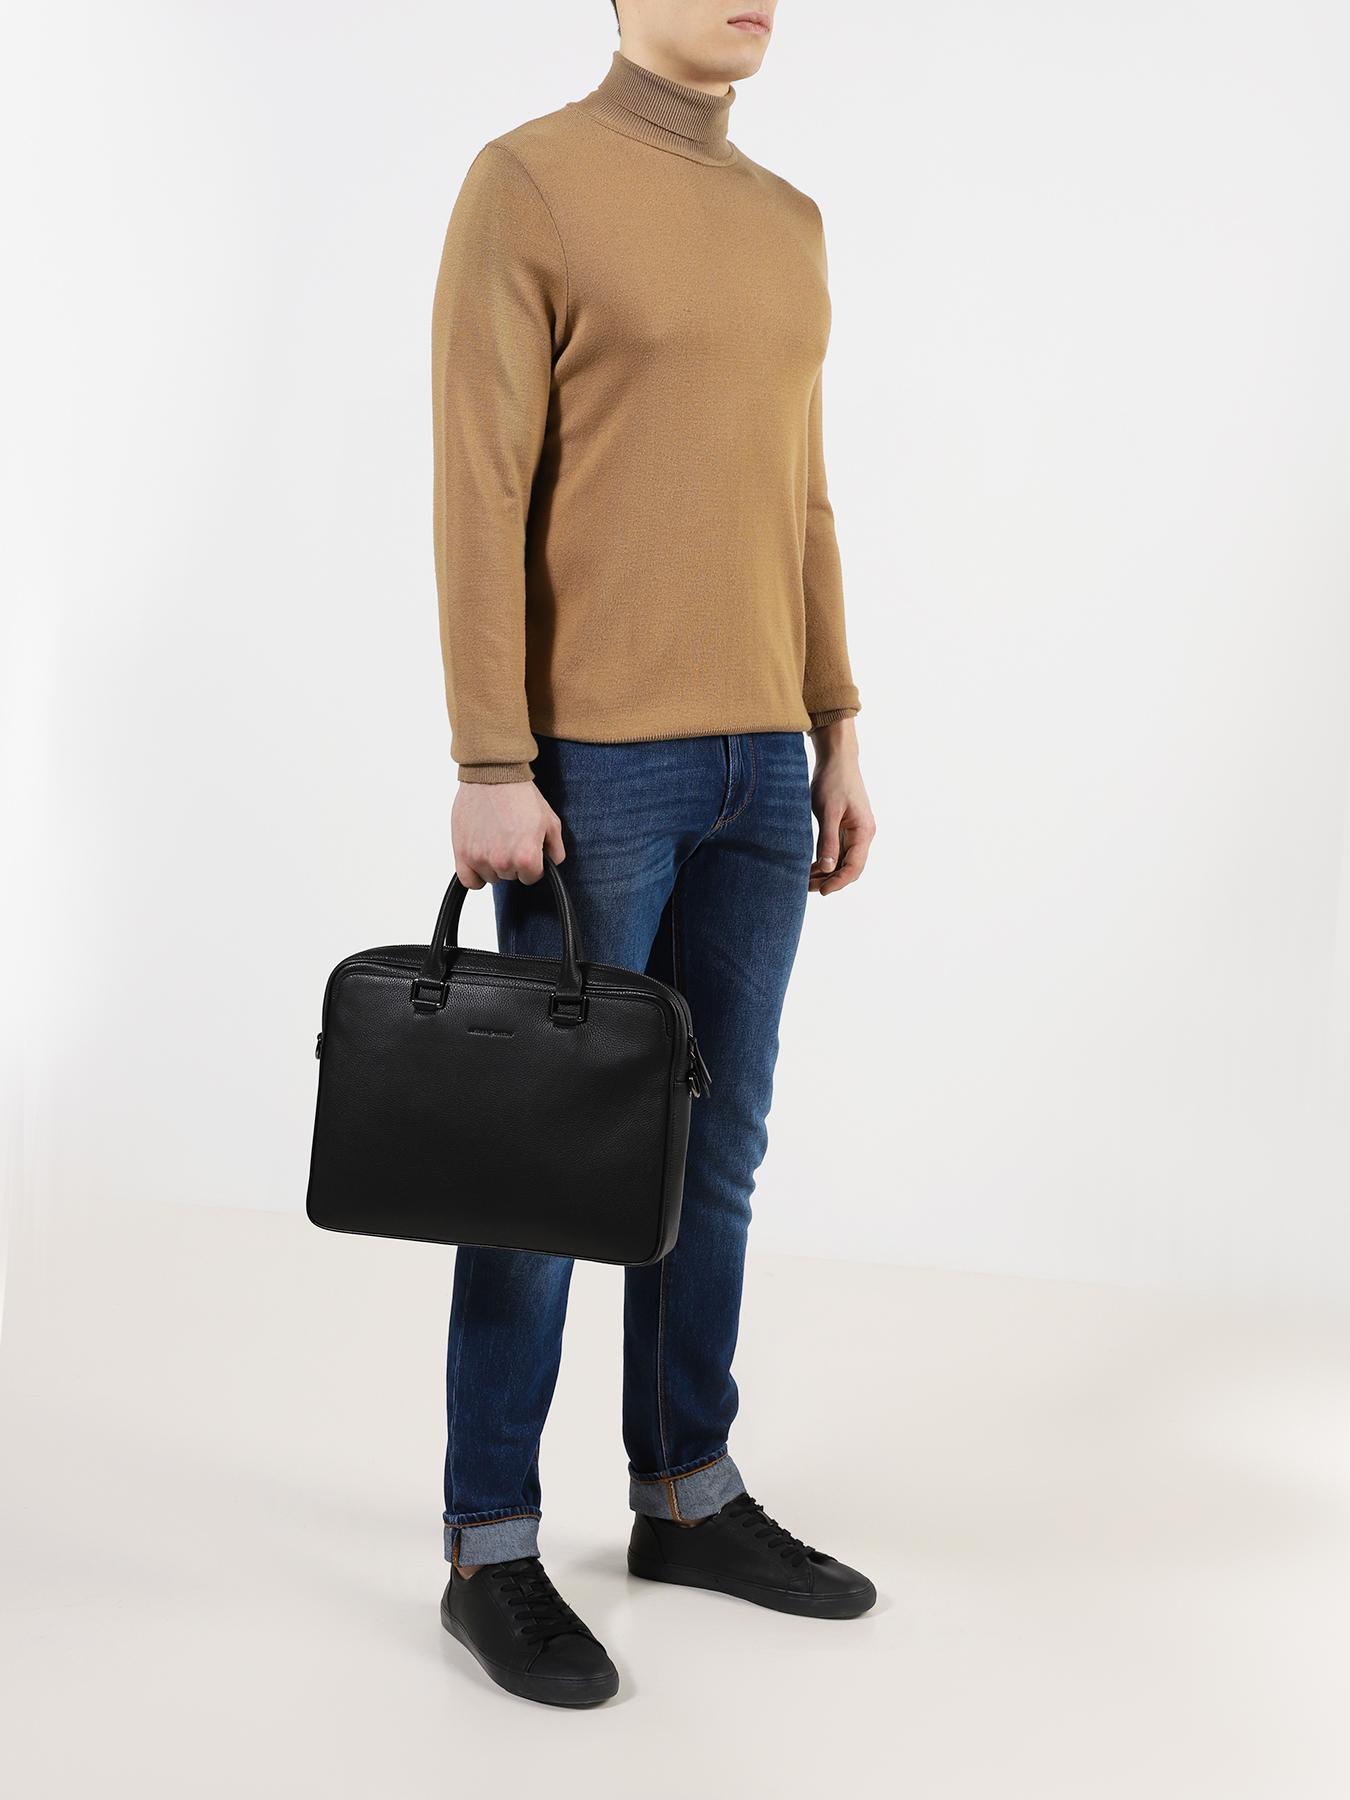 Сумка Alessandro Manzoni Сумка сумки женские alessandro birutti сумка 4009 abir4009 синяя симф